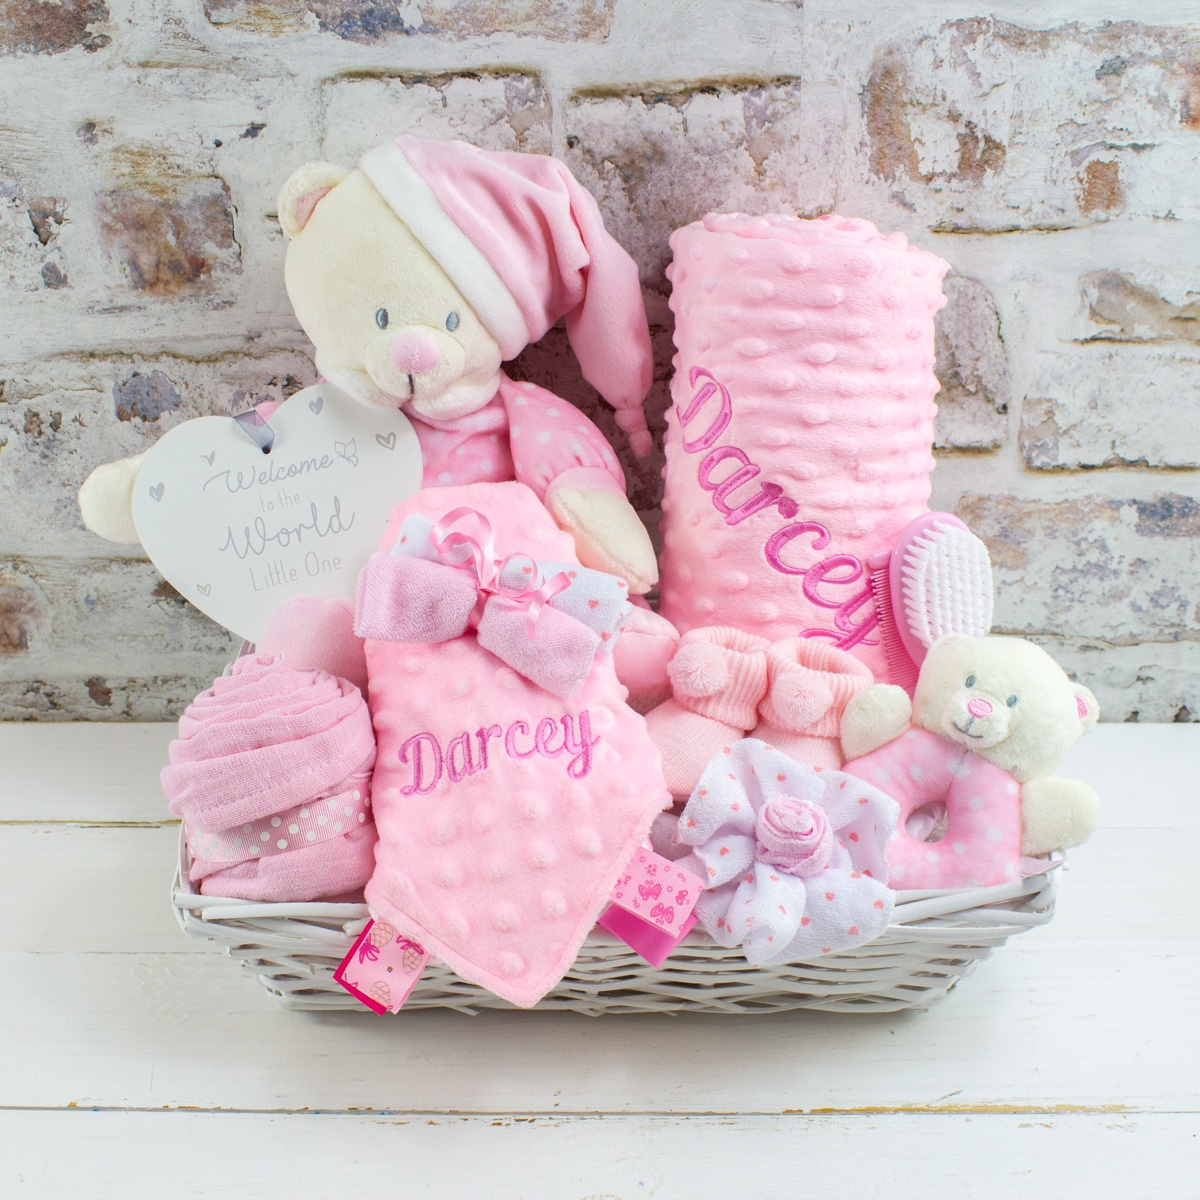 personalised ultimate baby gift hamper